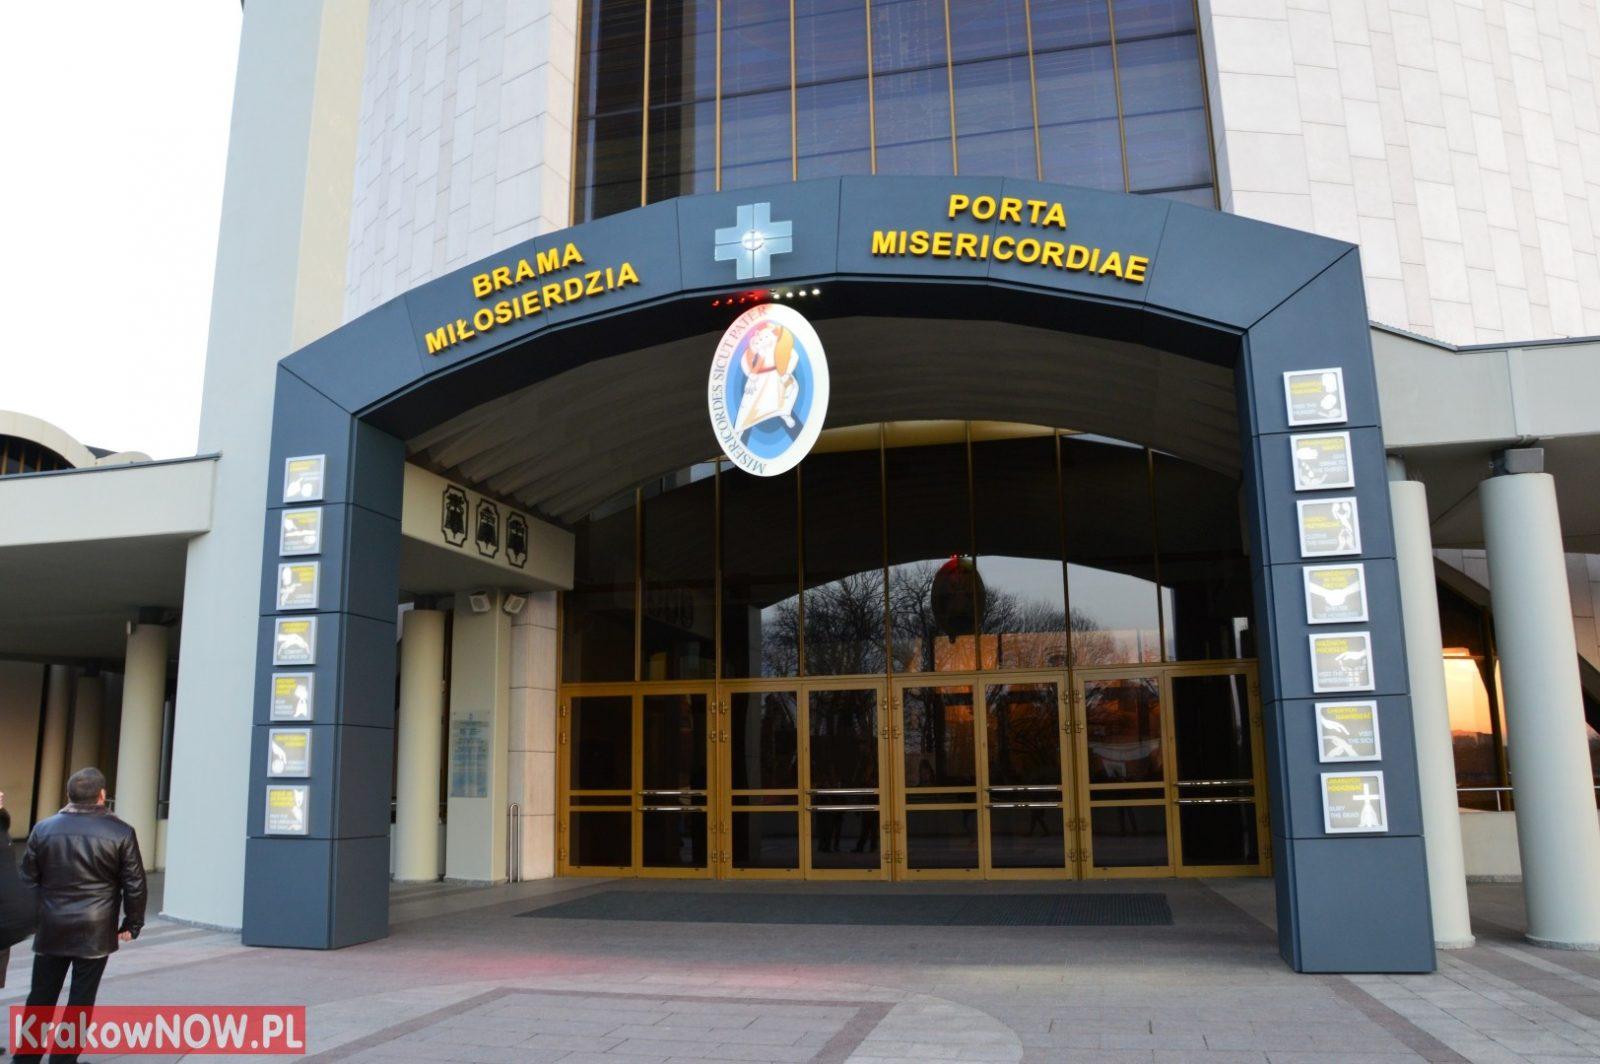 sanktuarium bozego milosierdzia krakow lagiewniki 36 - Giant wheel was successfully launched